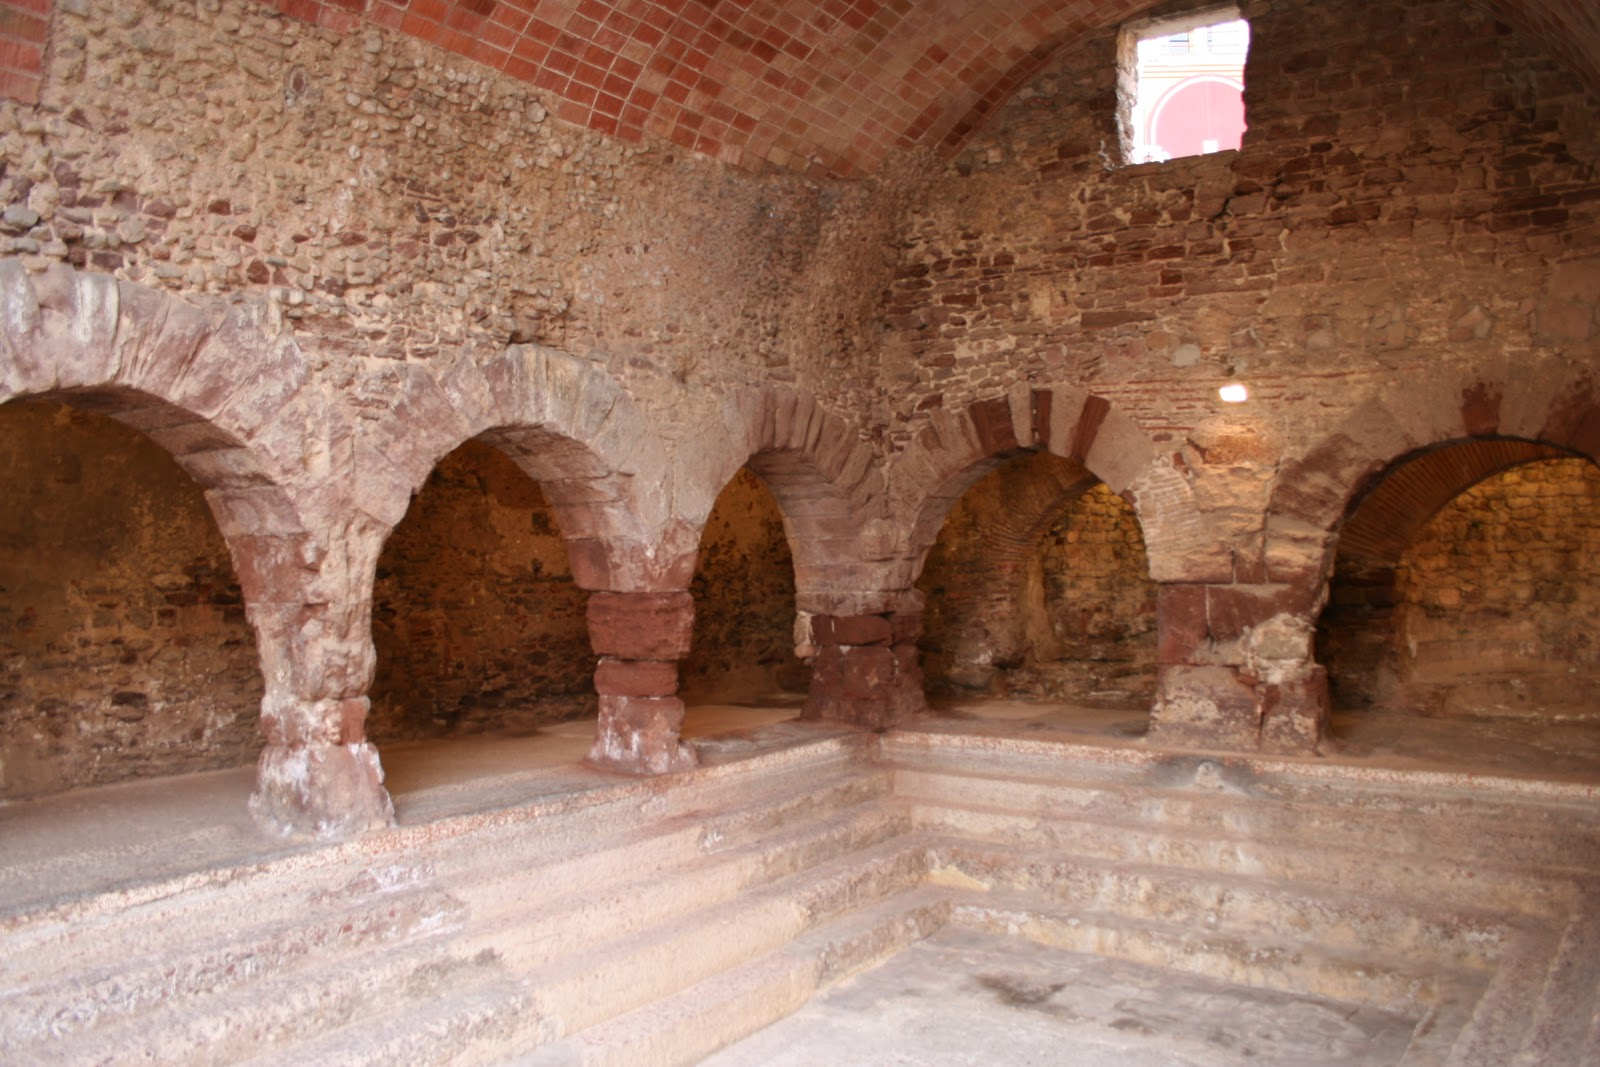 Baños Romanos Merida:Antiguas Culturas Clasicas: Termas Romanas